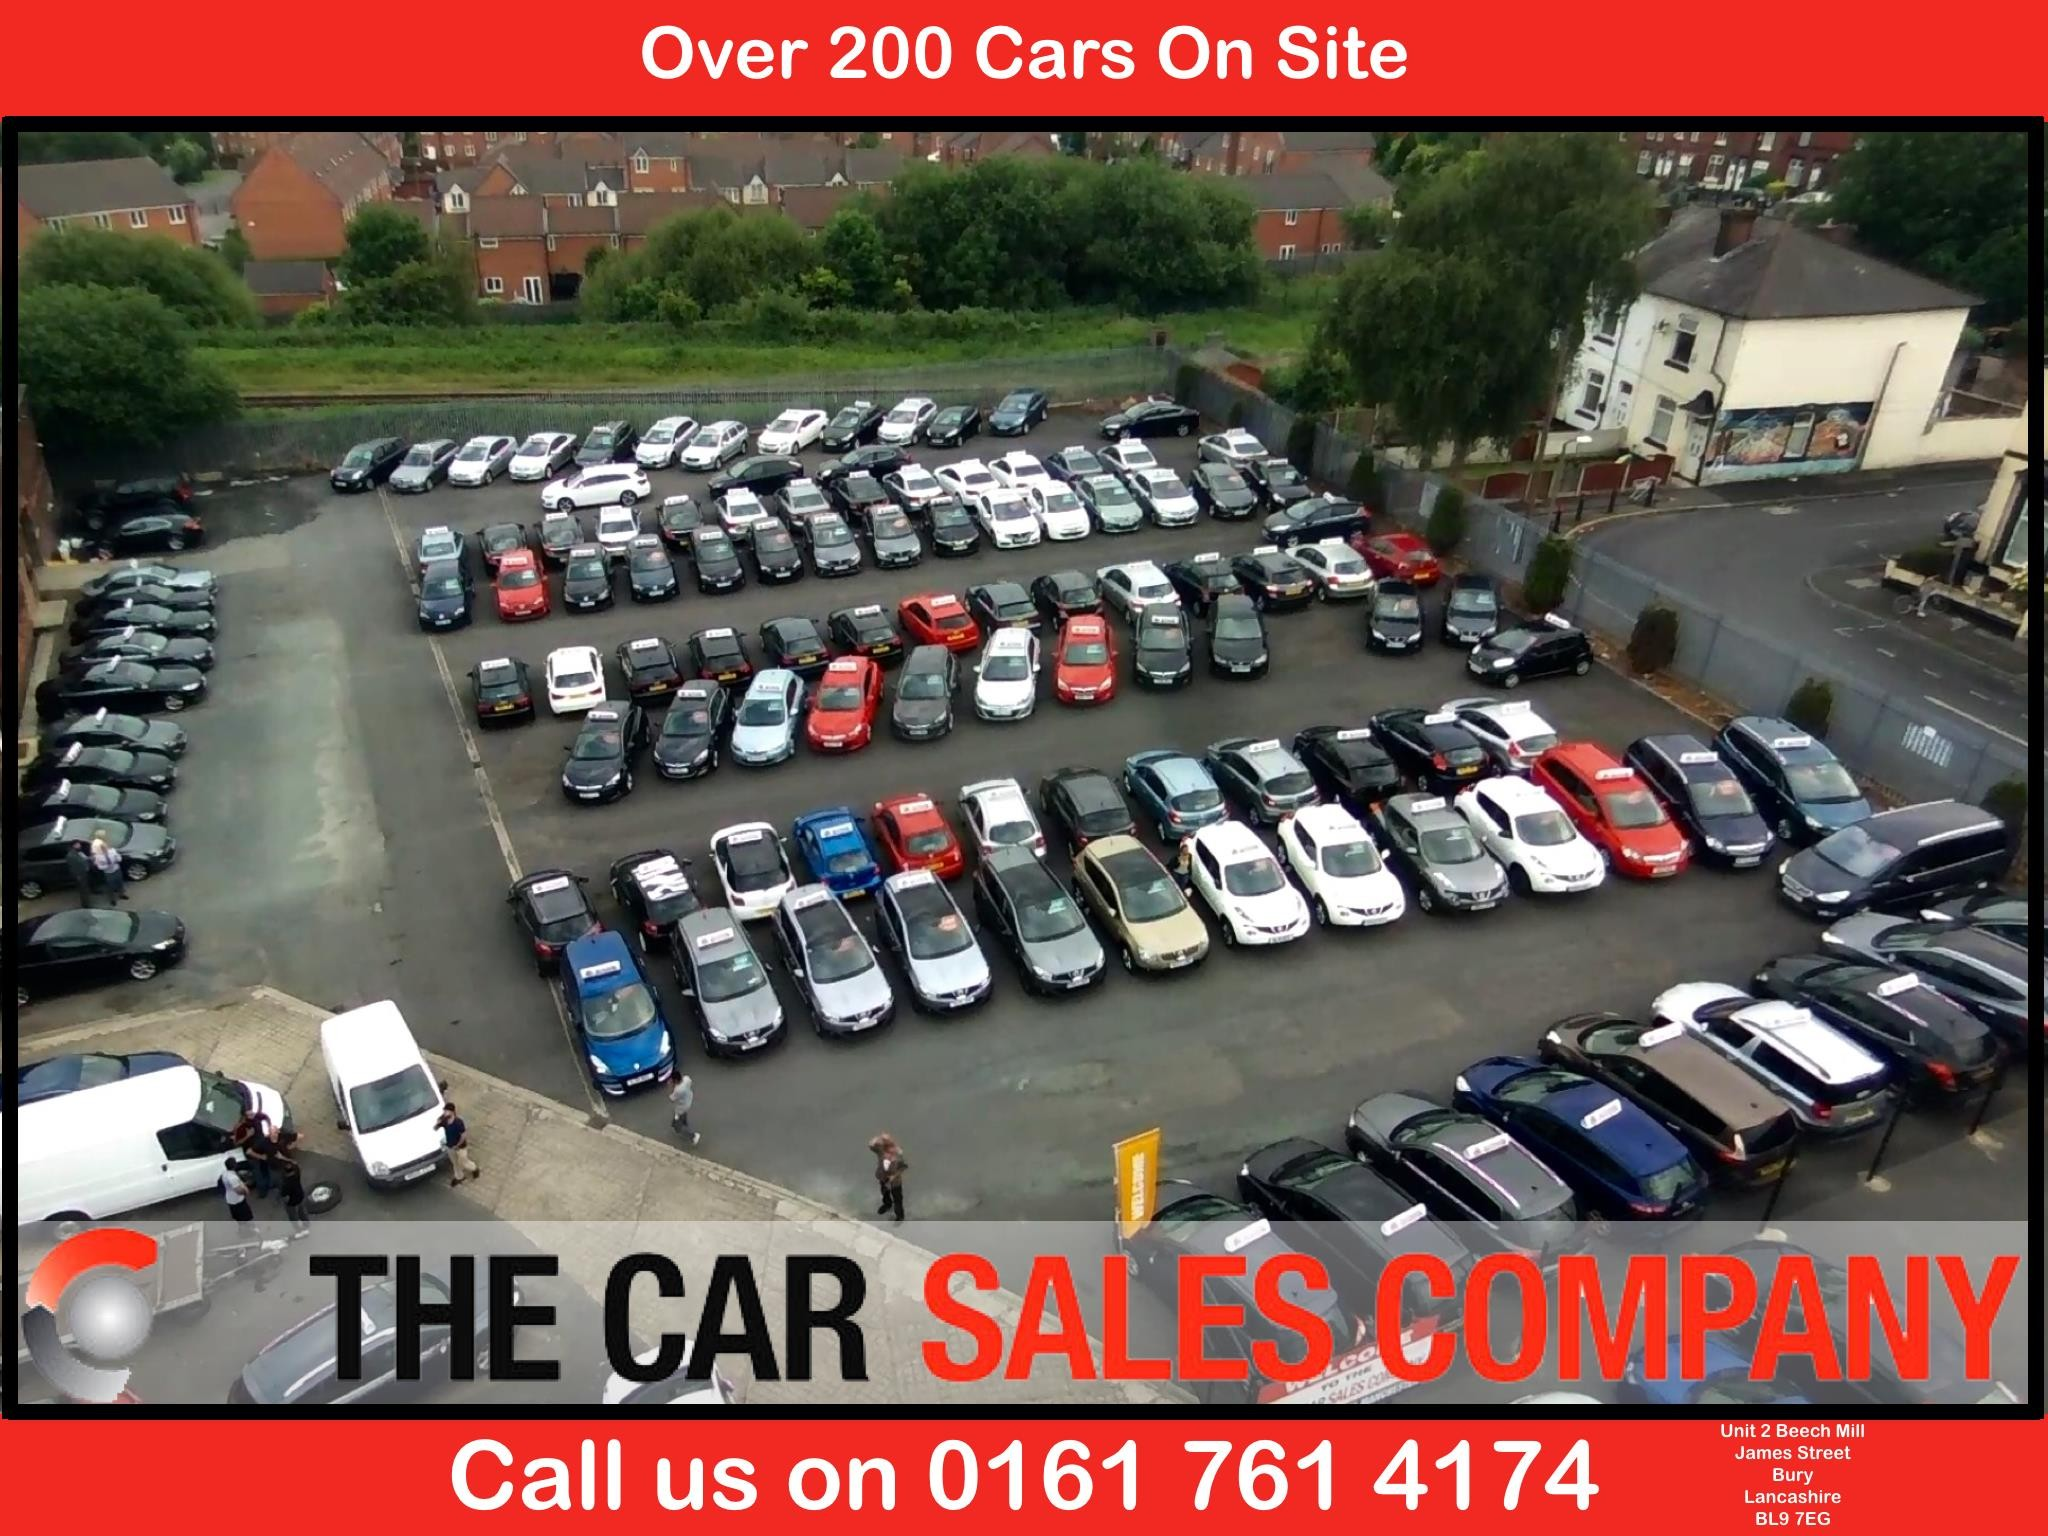 The Car Sales Company Bury Ltd Linkedin